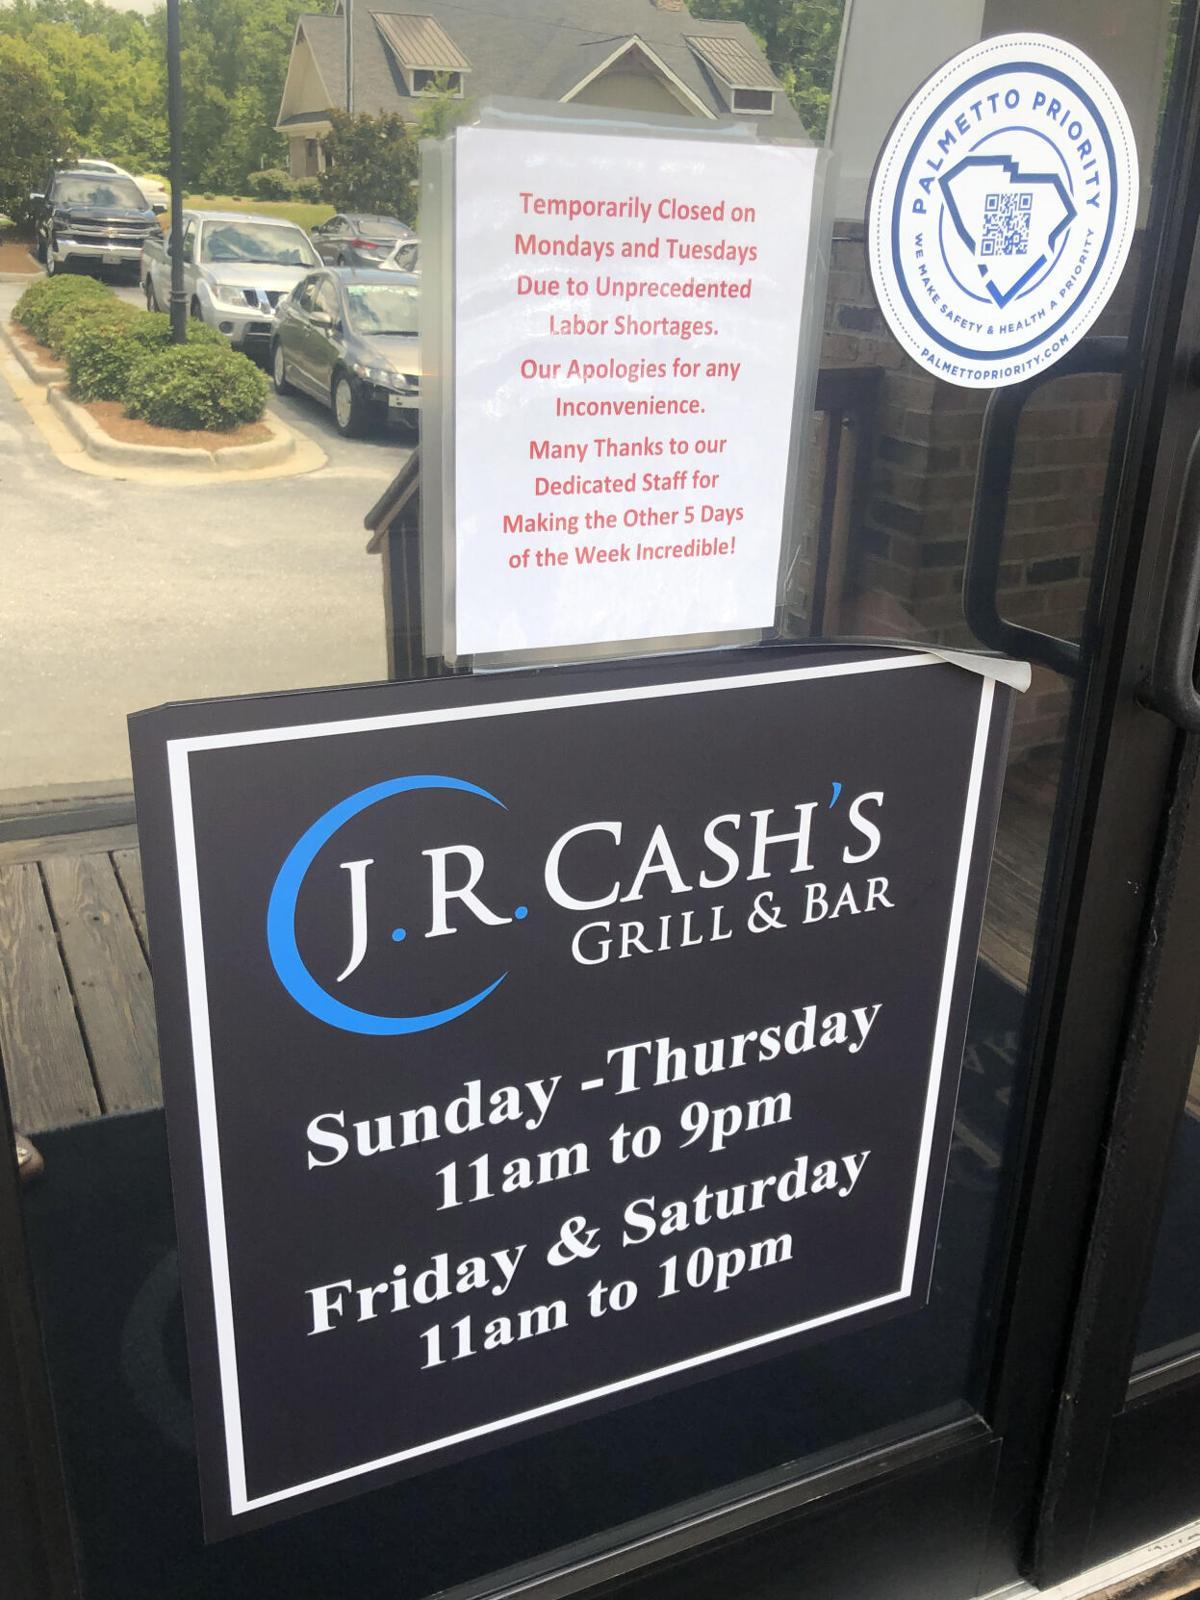 jr cash.jpg